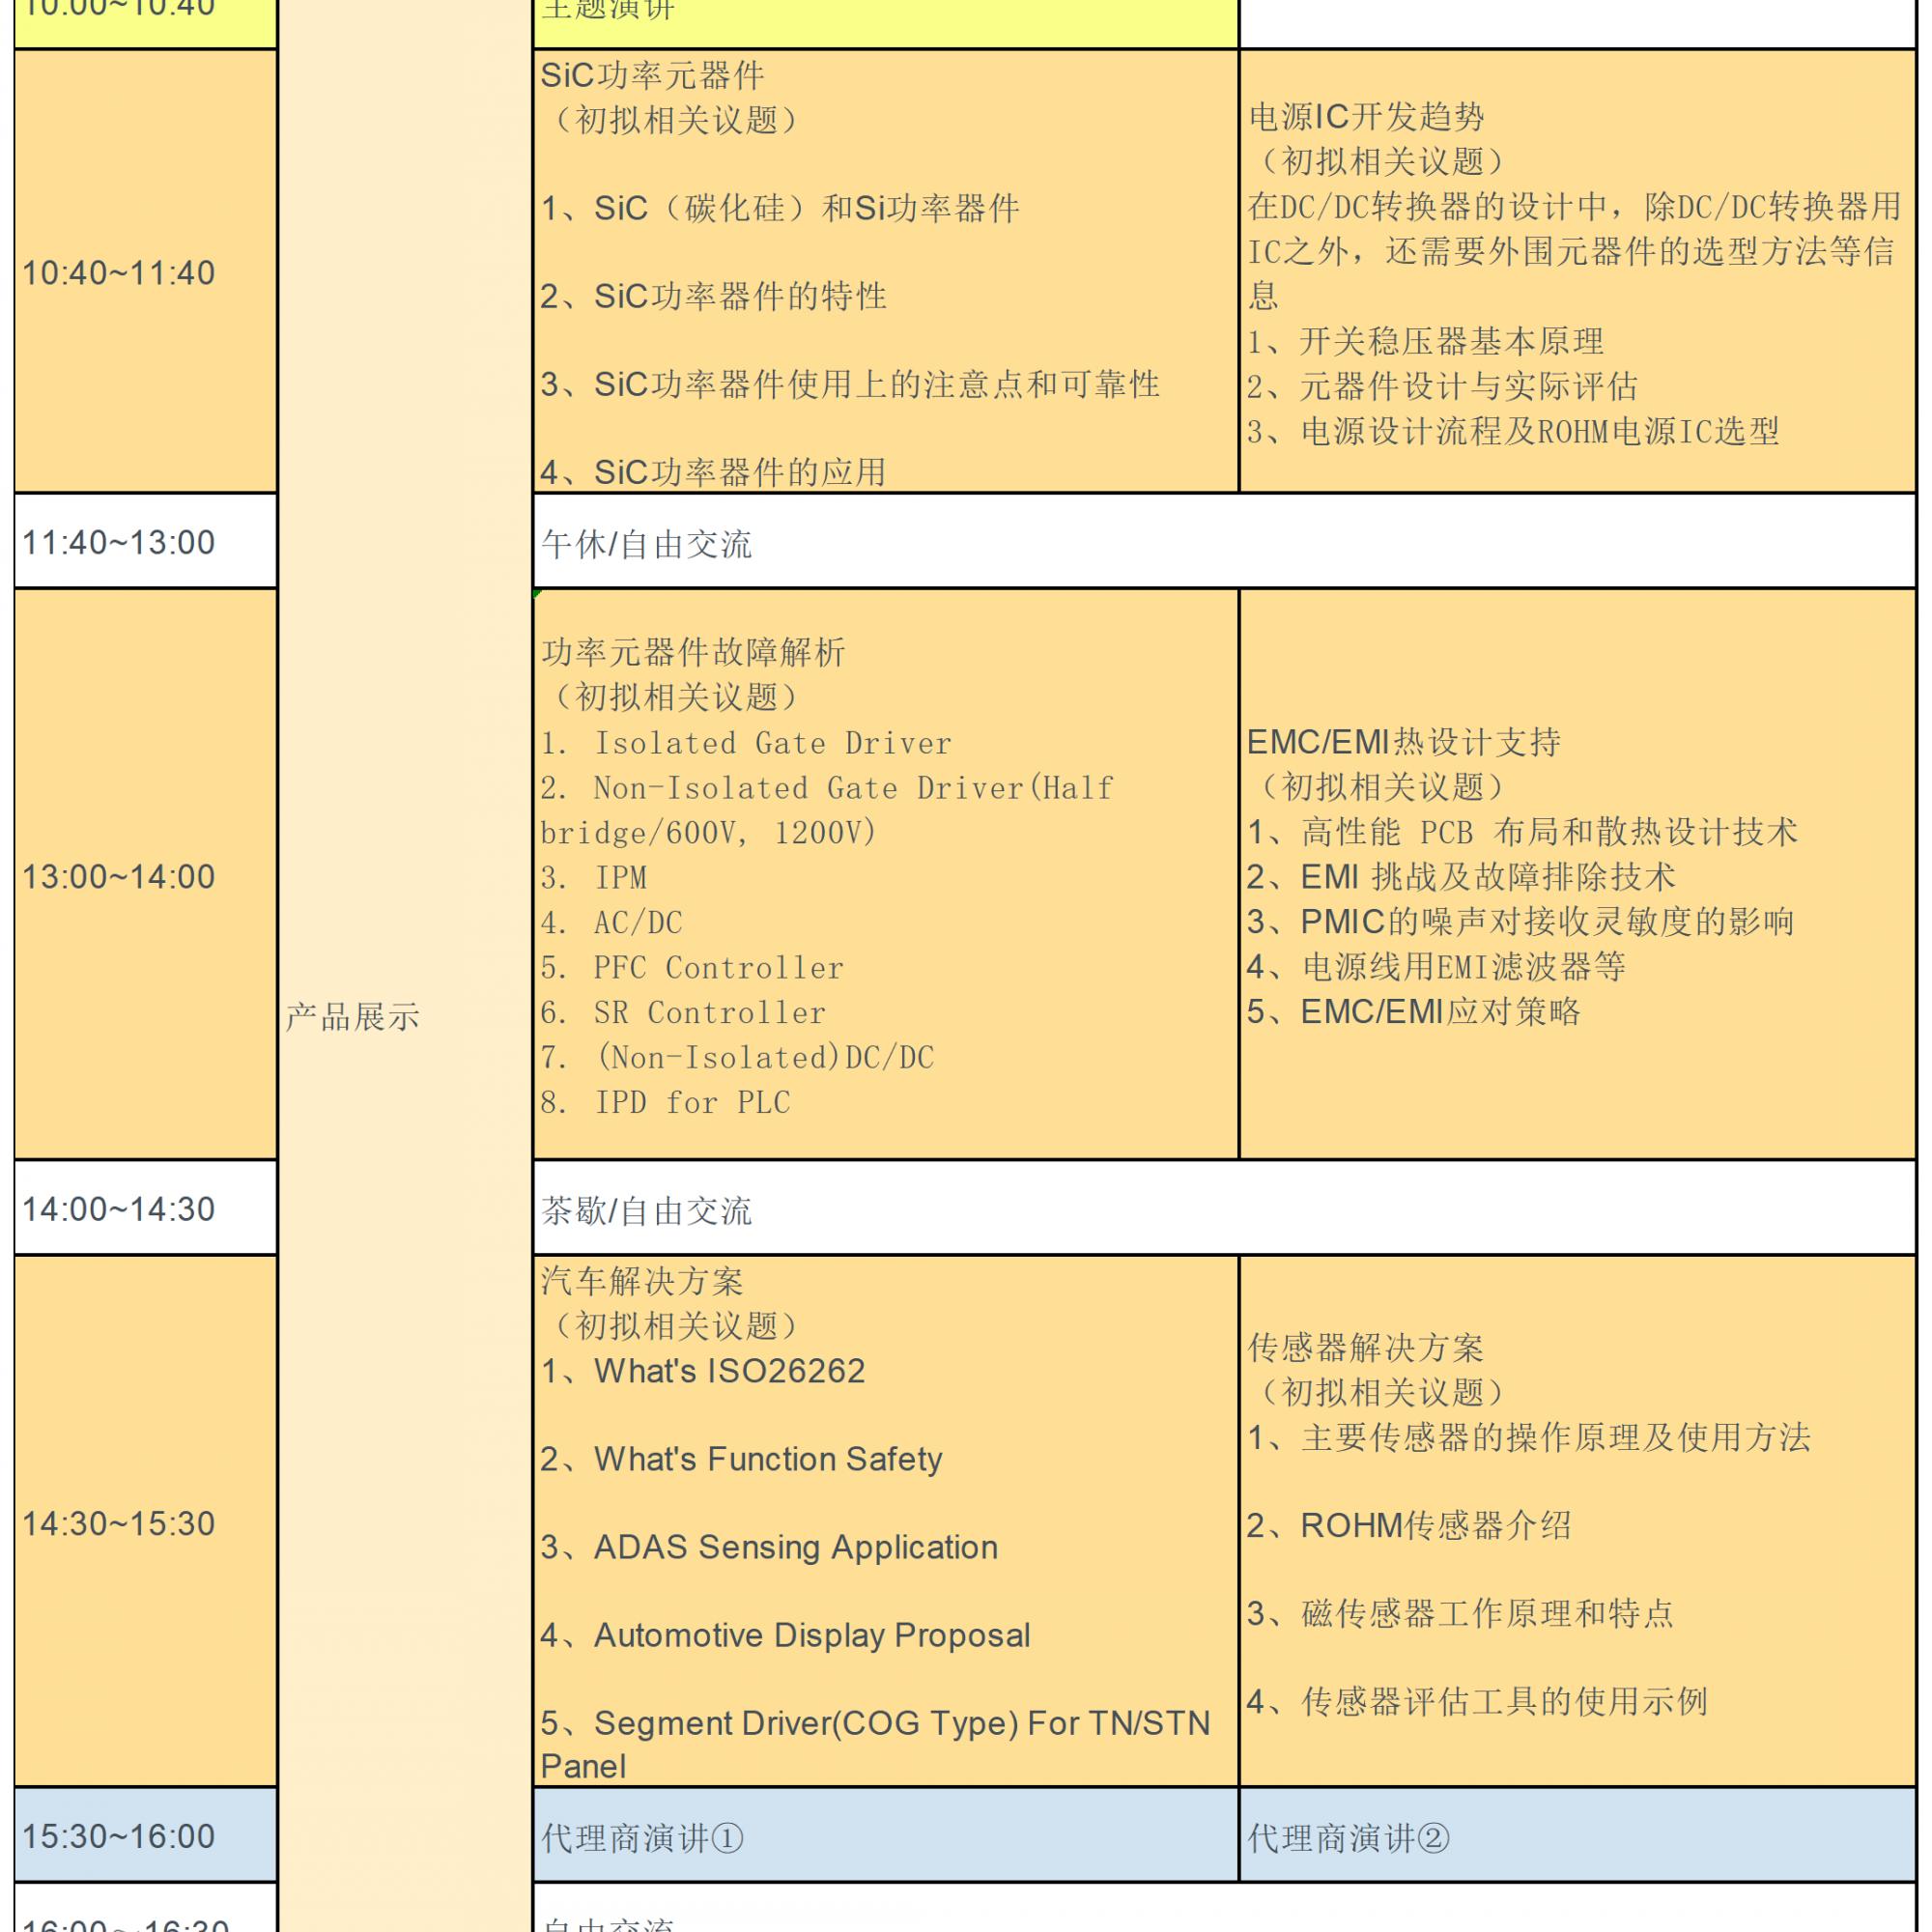 【2019ROHM科技展】:4大展区+6场技术研讨会,邀您免费参会赢豪礼!(总价值超过10000元)